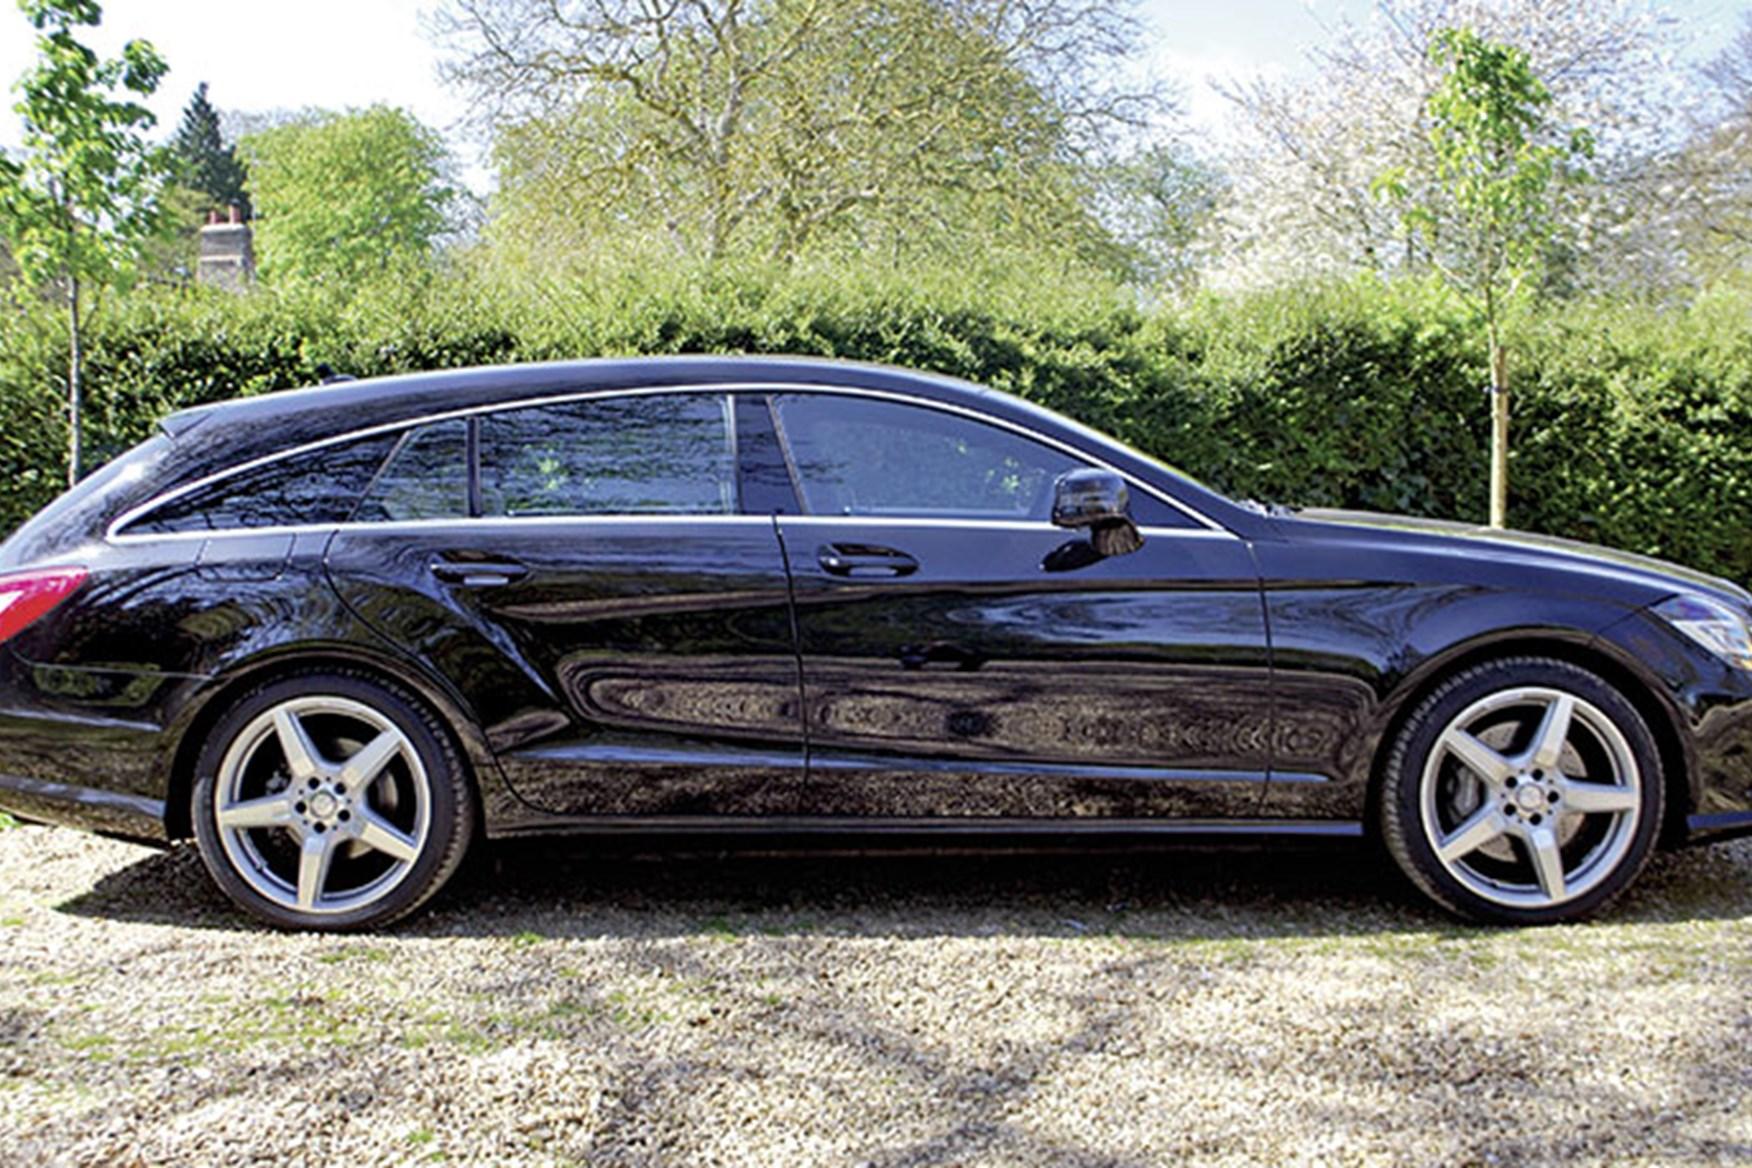 Citroen C5 Fuse Box Faults Electrical Circuit Wiring Problems Mercedes Cls Shooting Brake 2015 Longterm Test Review Car Magazinerhcarmagazinecouk